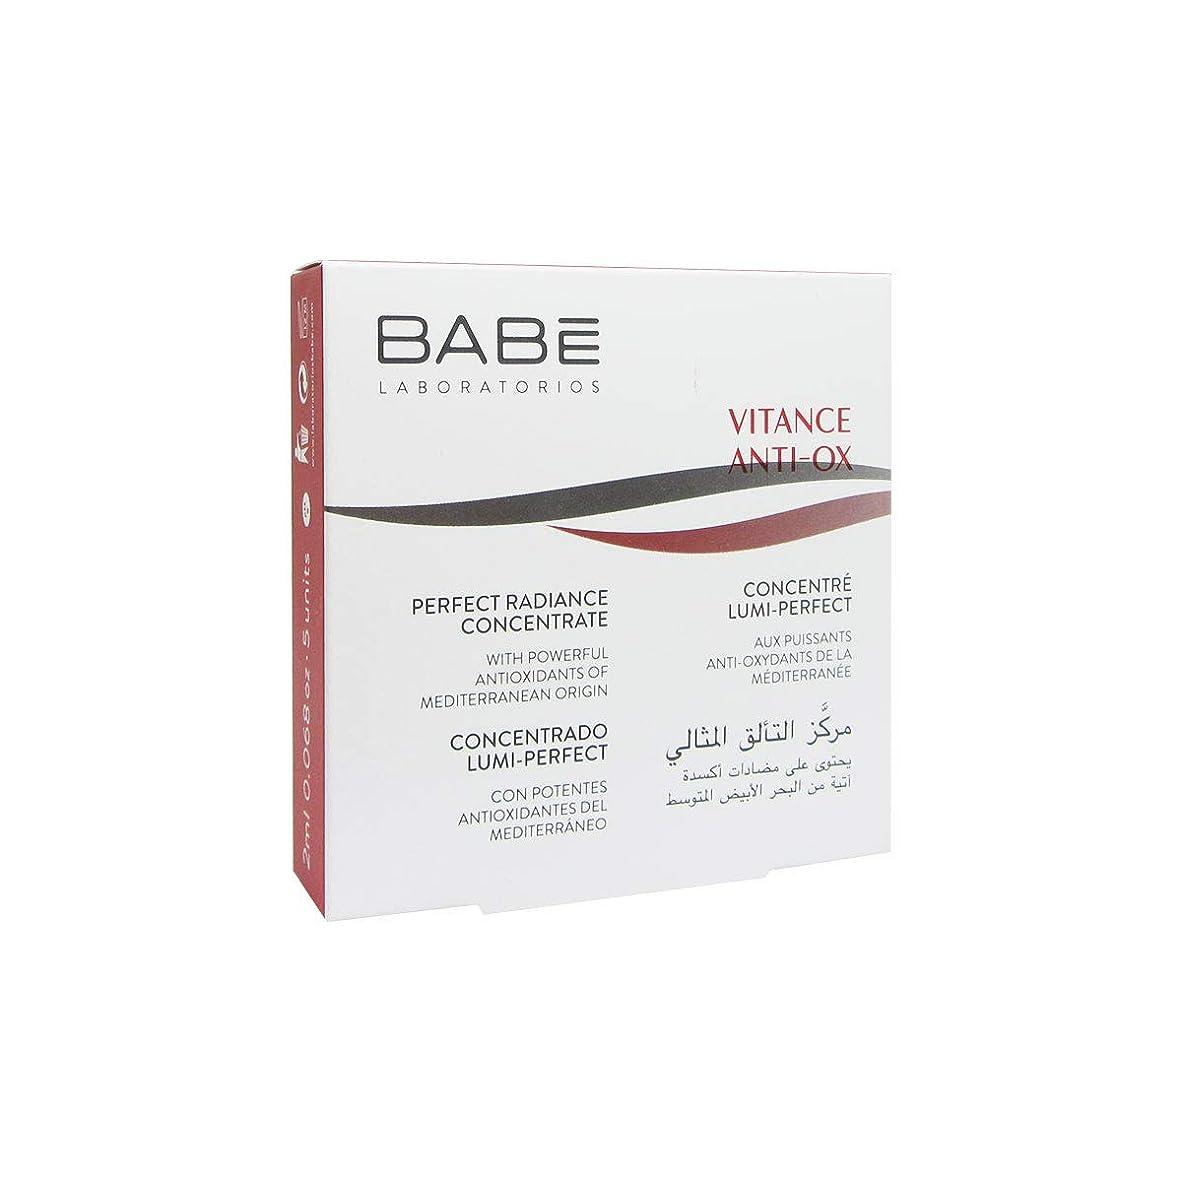 鋭く抵抗導出Bab Vitance Anti-ox Lumi-ox Concentrate 5x2ml [並行輸入品]